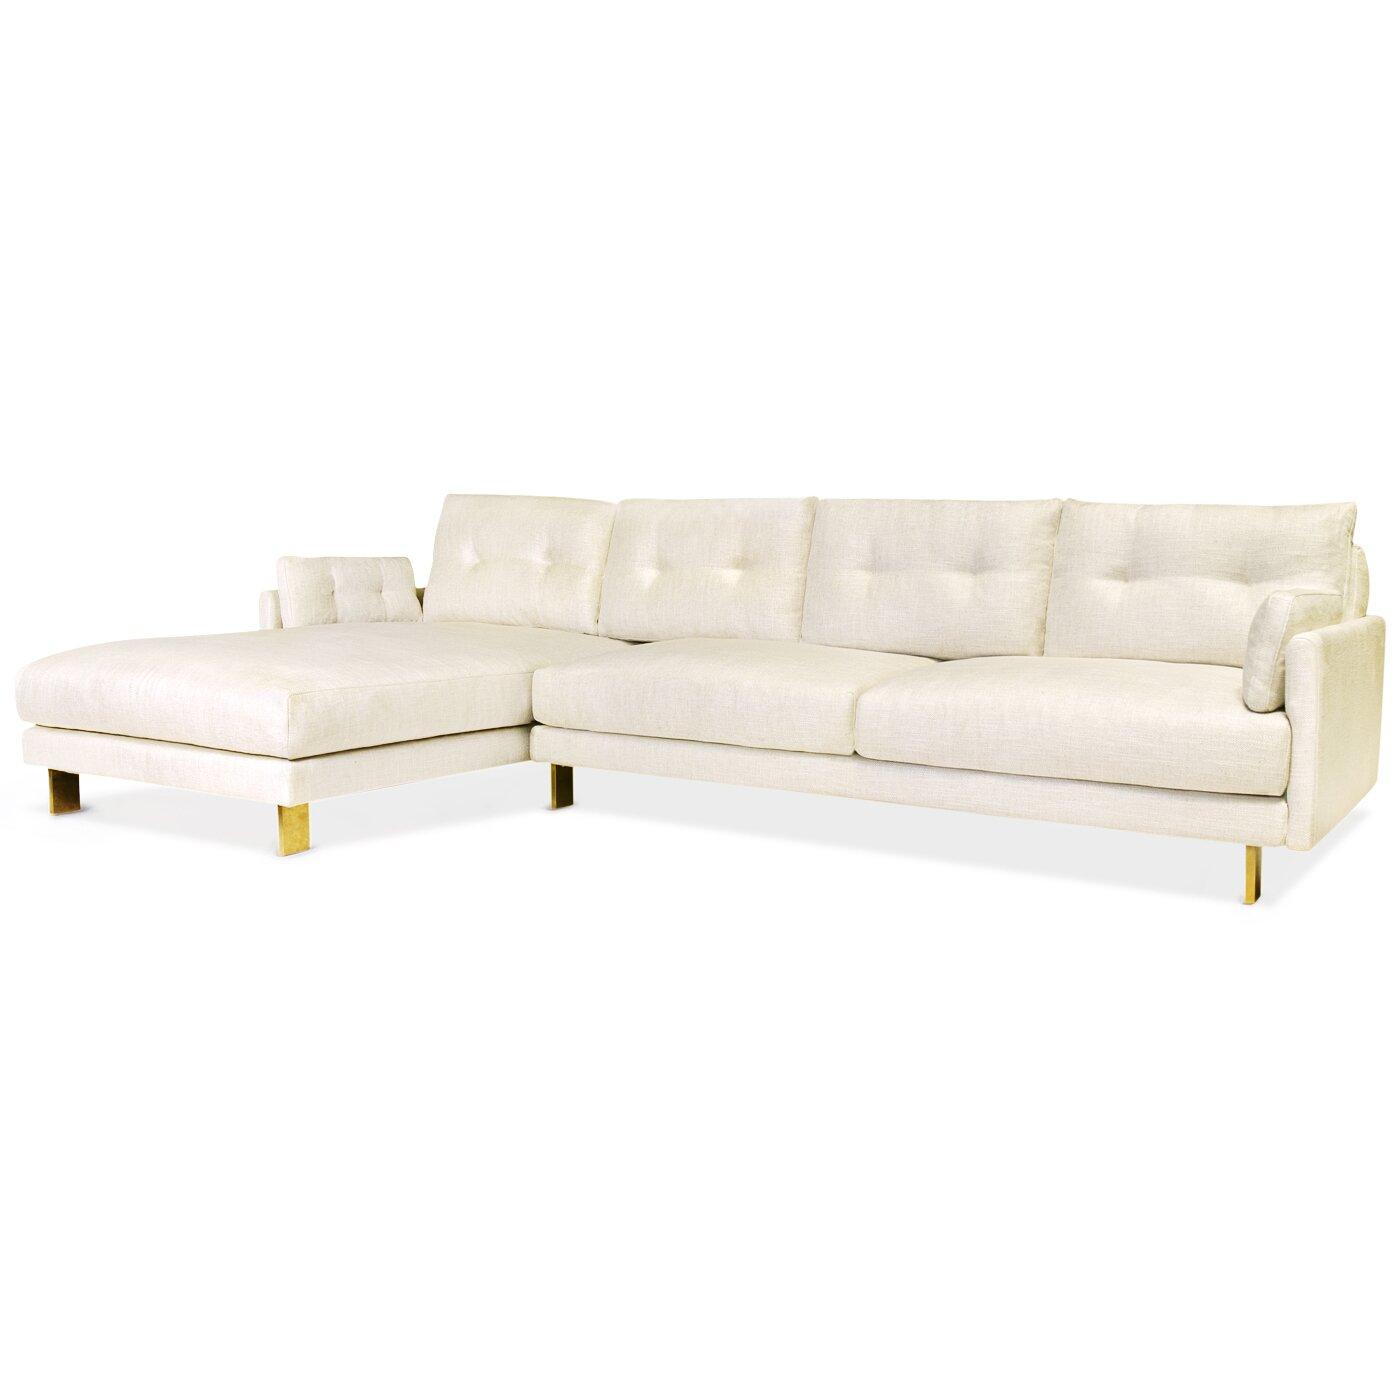 Sectional Sofa Sale Birmingham Al: Malibu Sectional